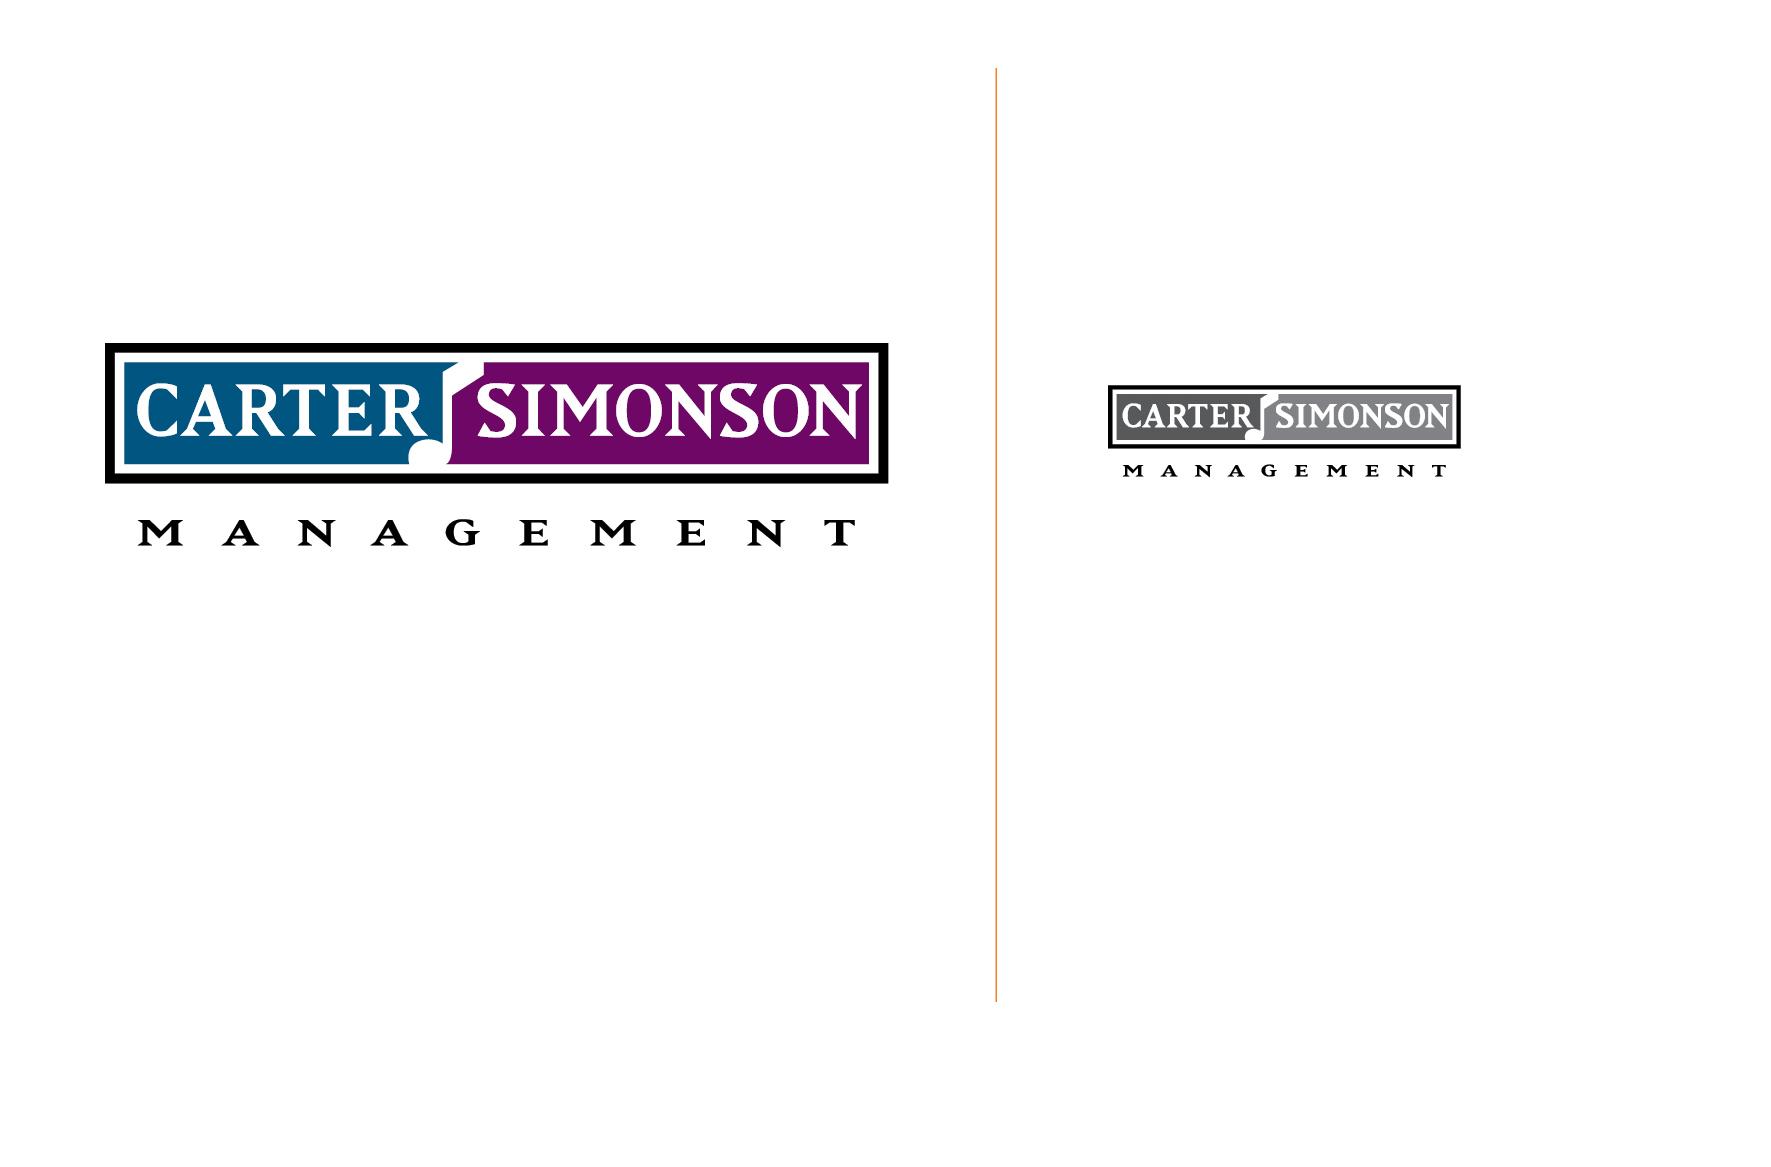 Carter Simonson Management -  Music management partnership